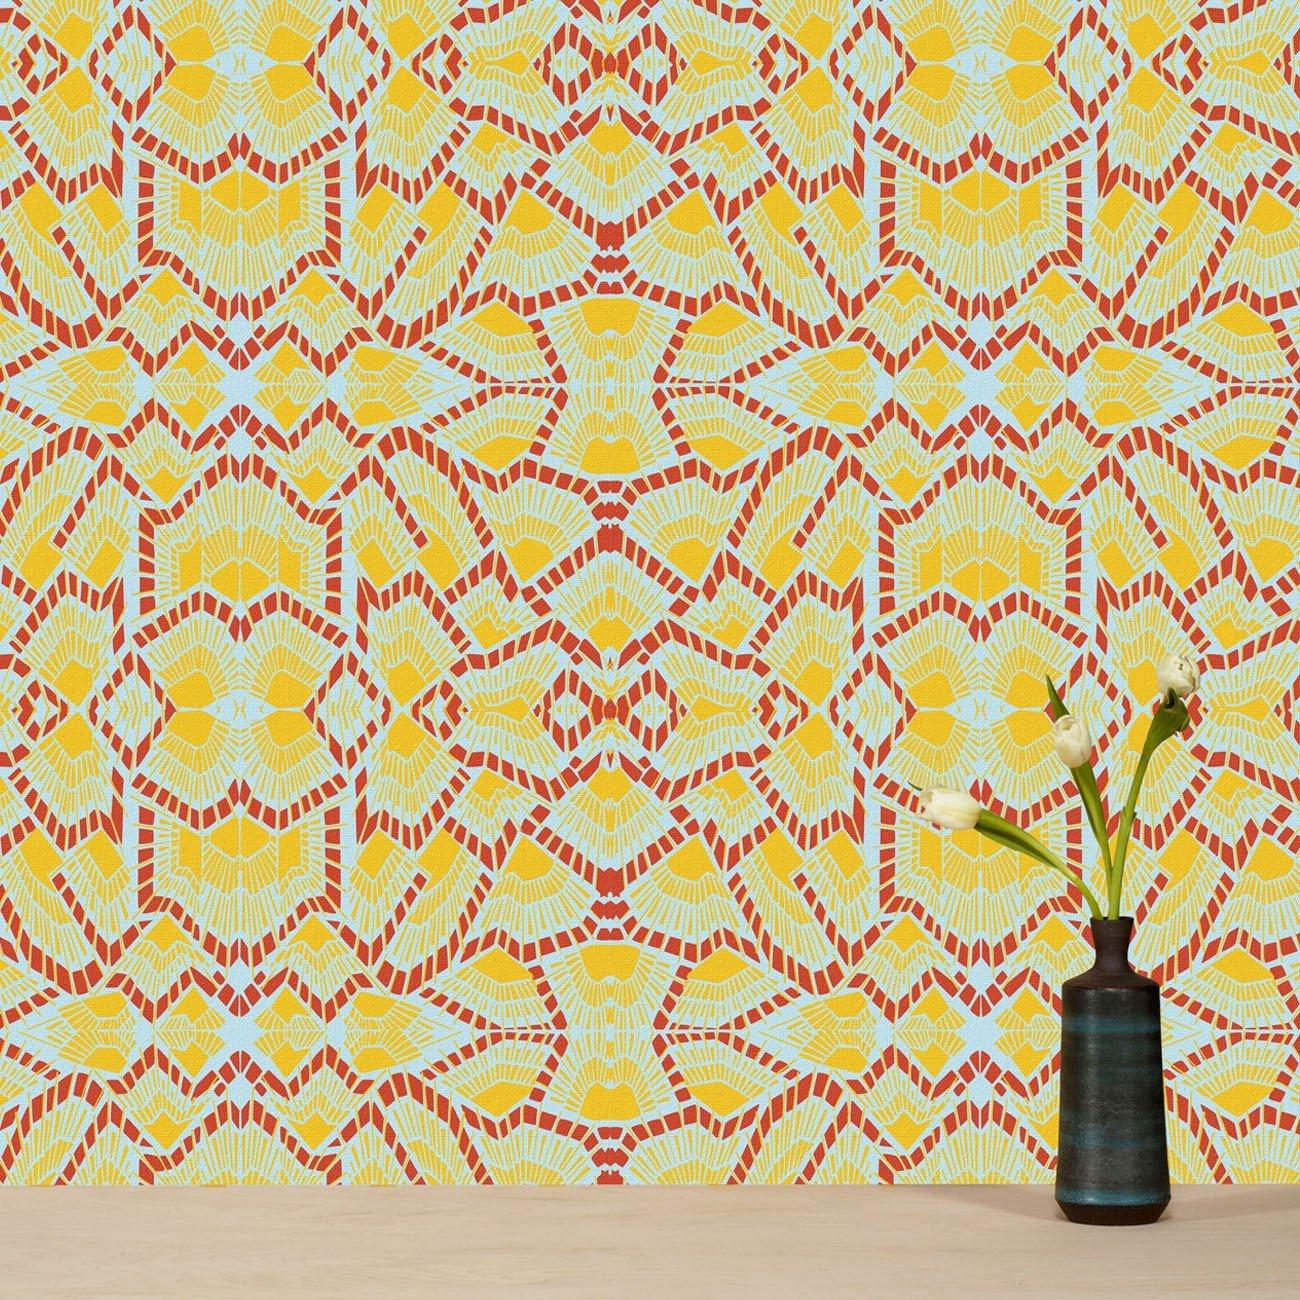 Wolfum deco sunshine wallpaper1